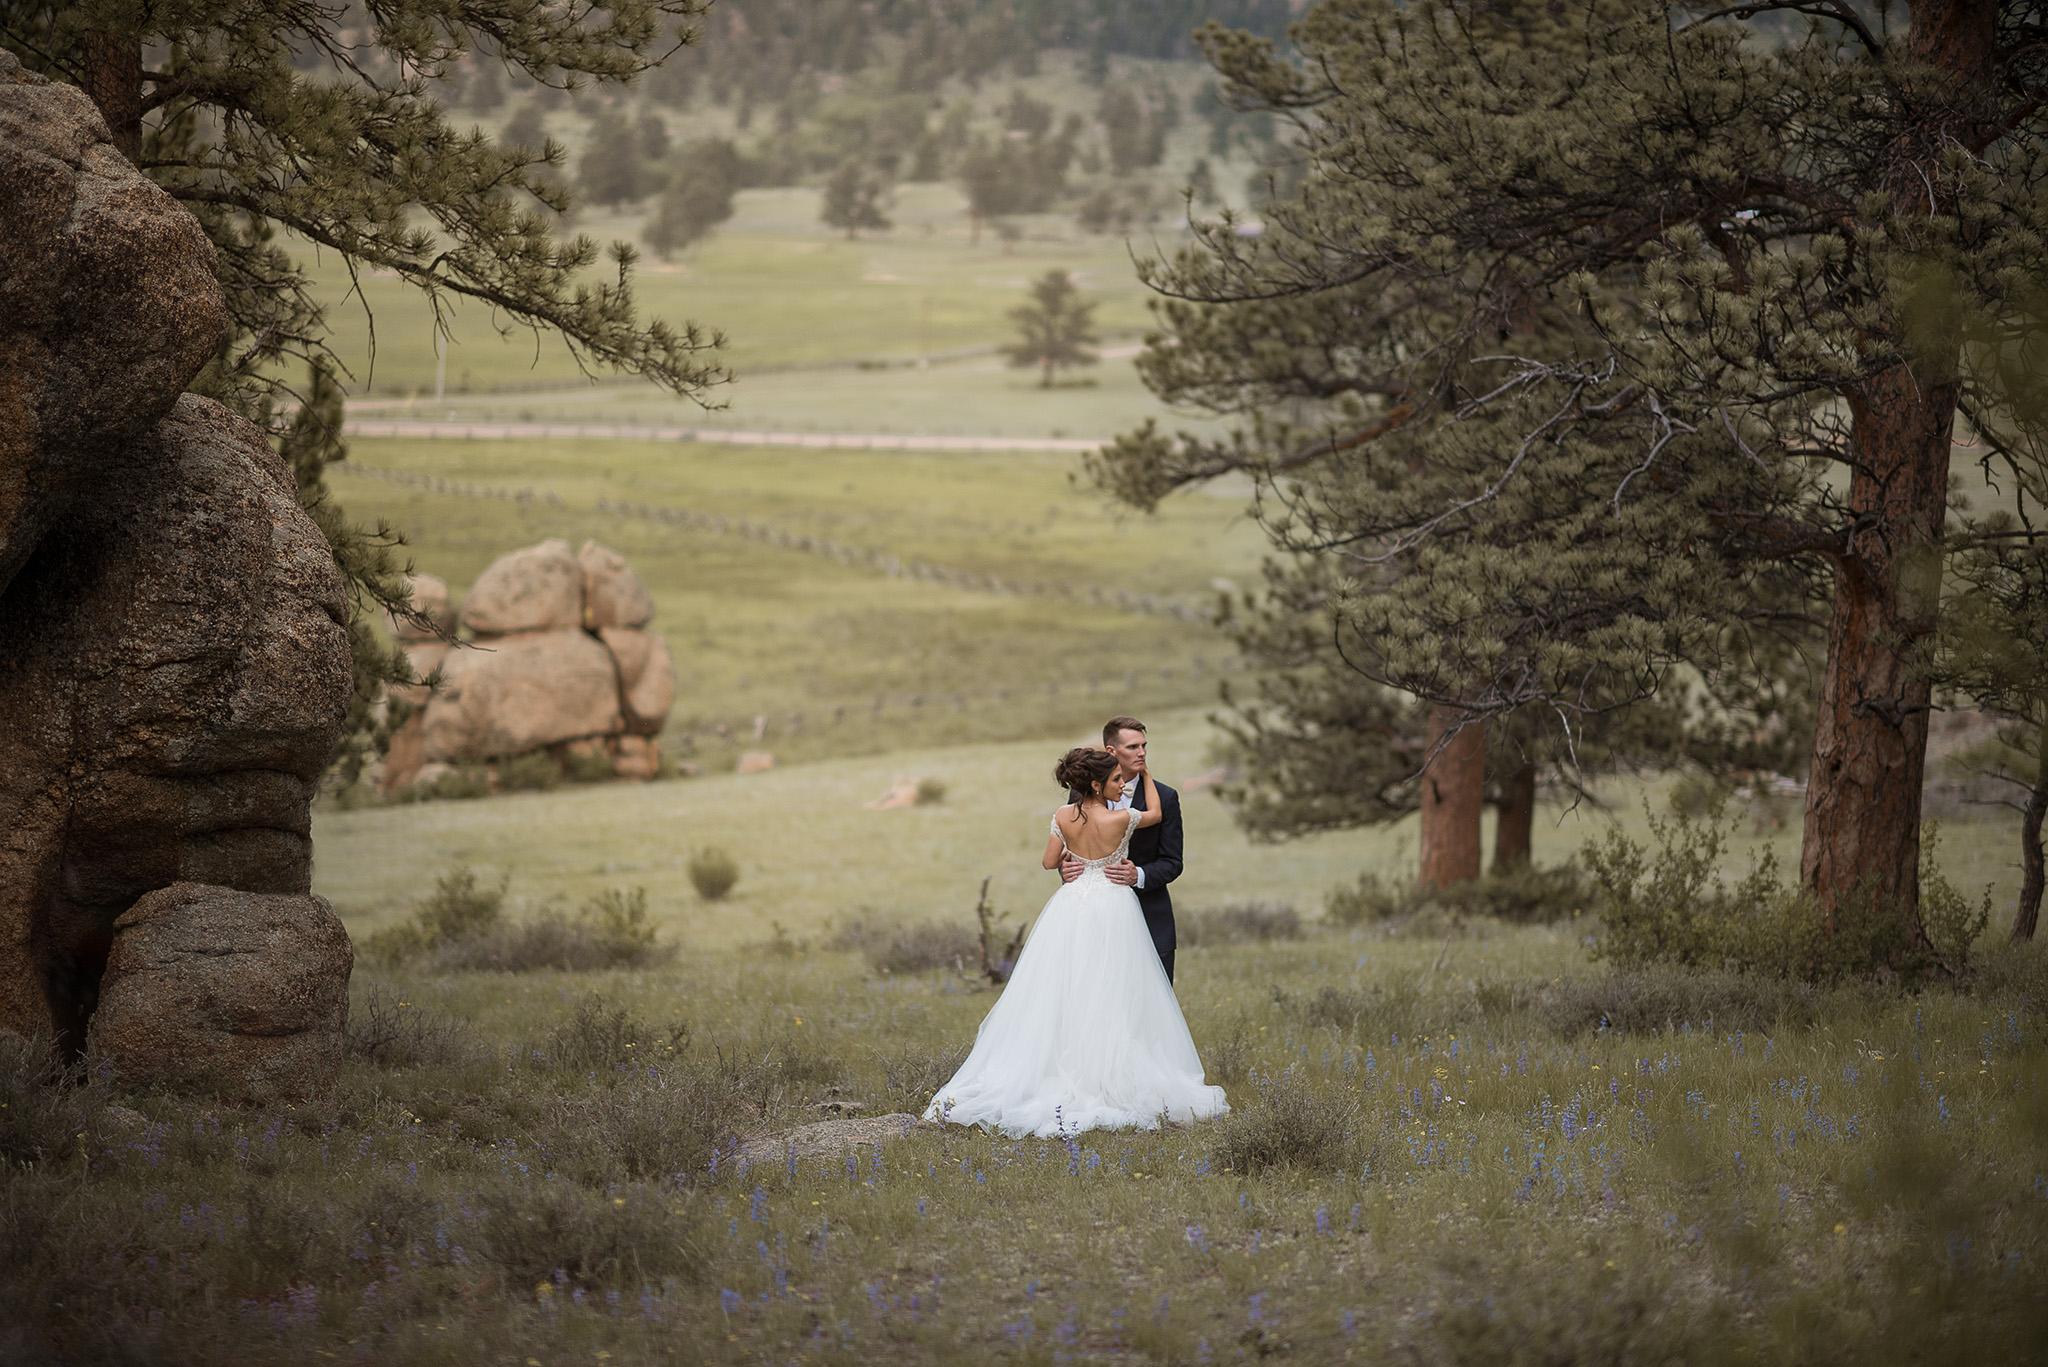 Estes-park-colorado-rocky-mountain-adventure-engagement-elopement-photographer-houston-texas